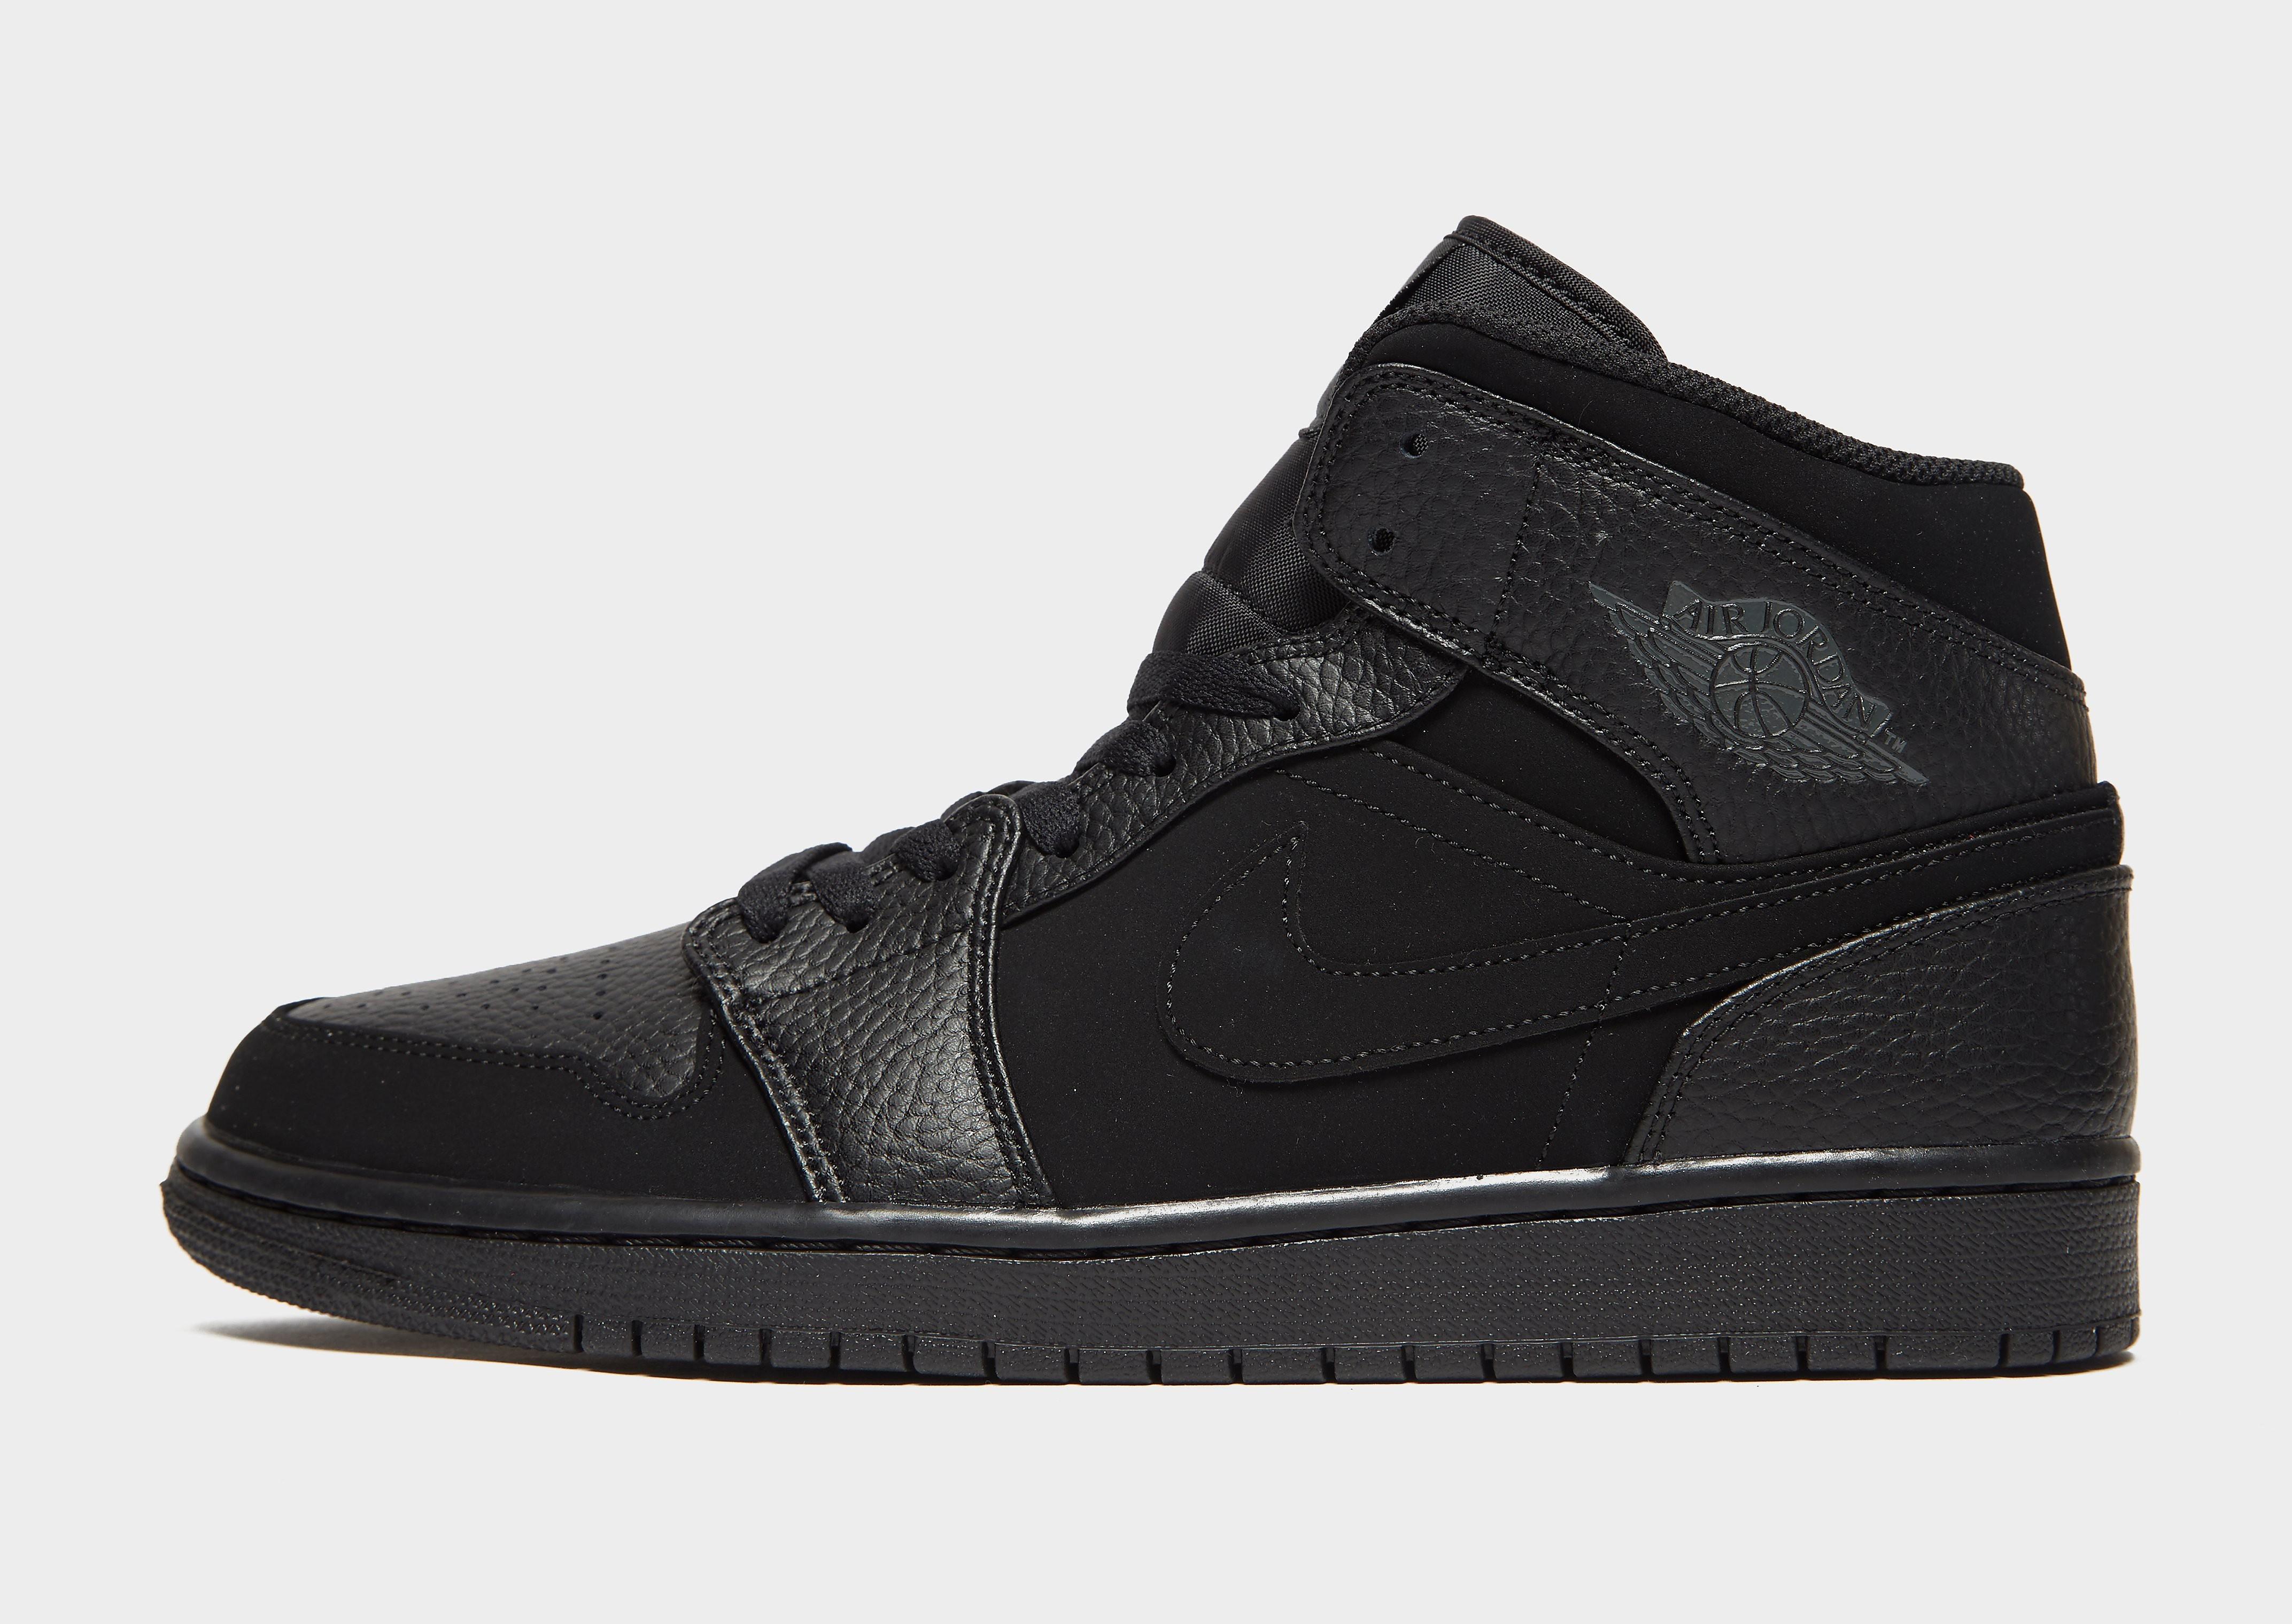 Jordan herensneaker zwart